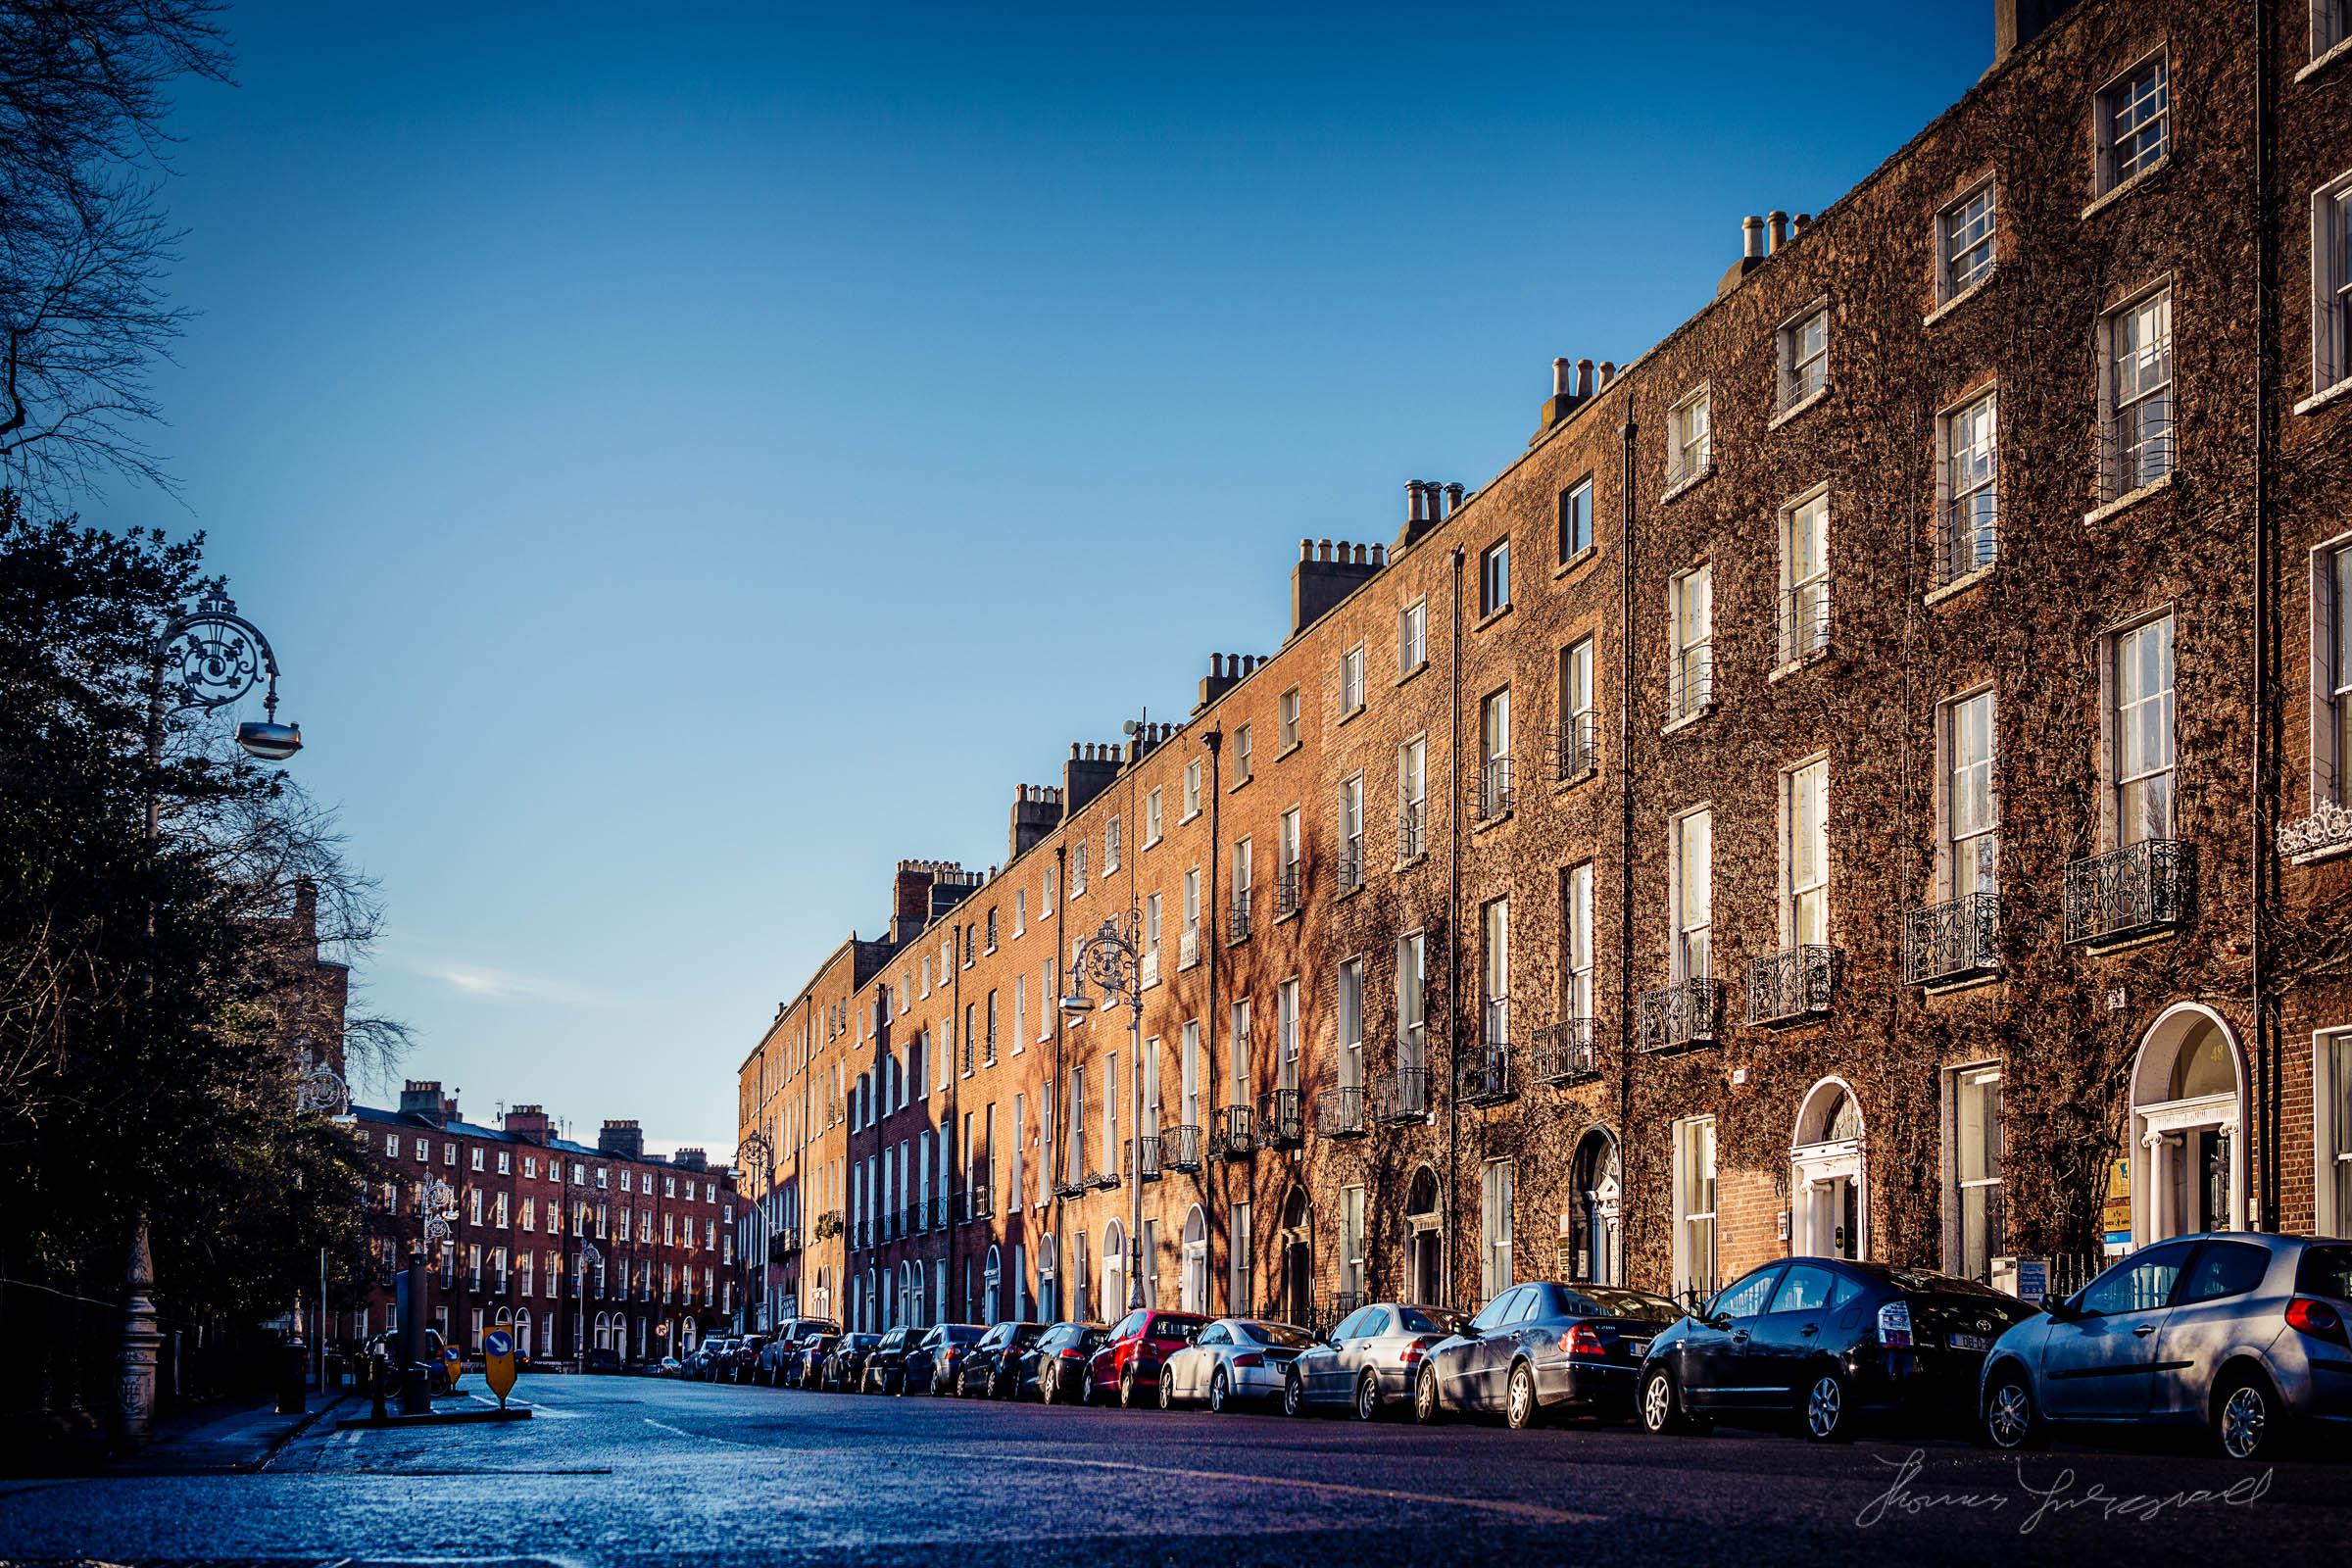 Winter-Light-Ireland-09.jpg